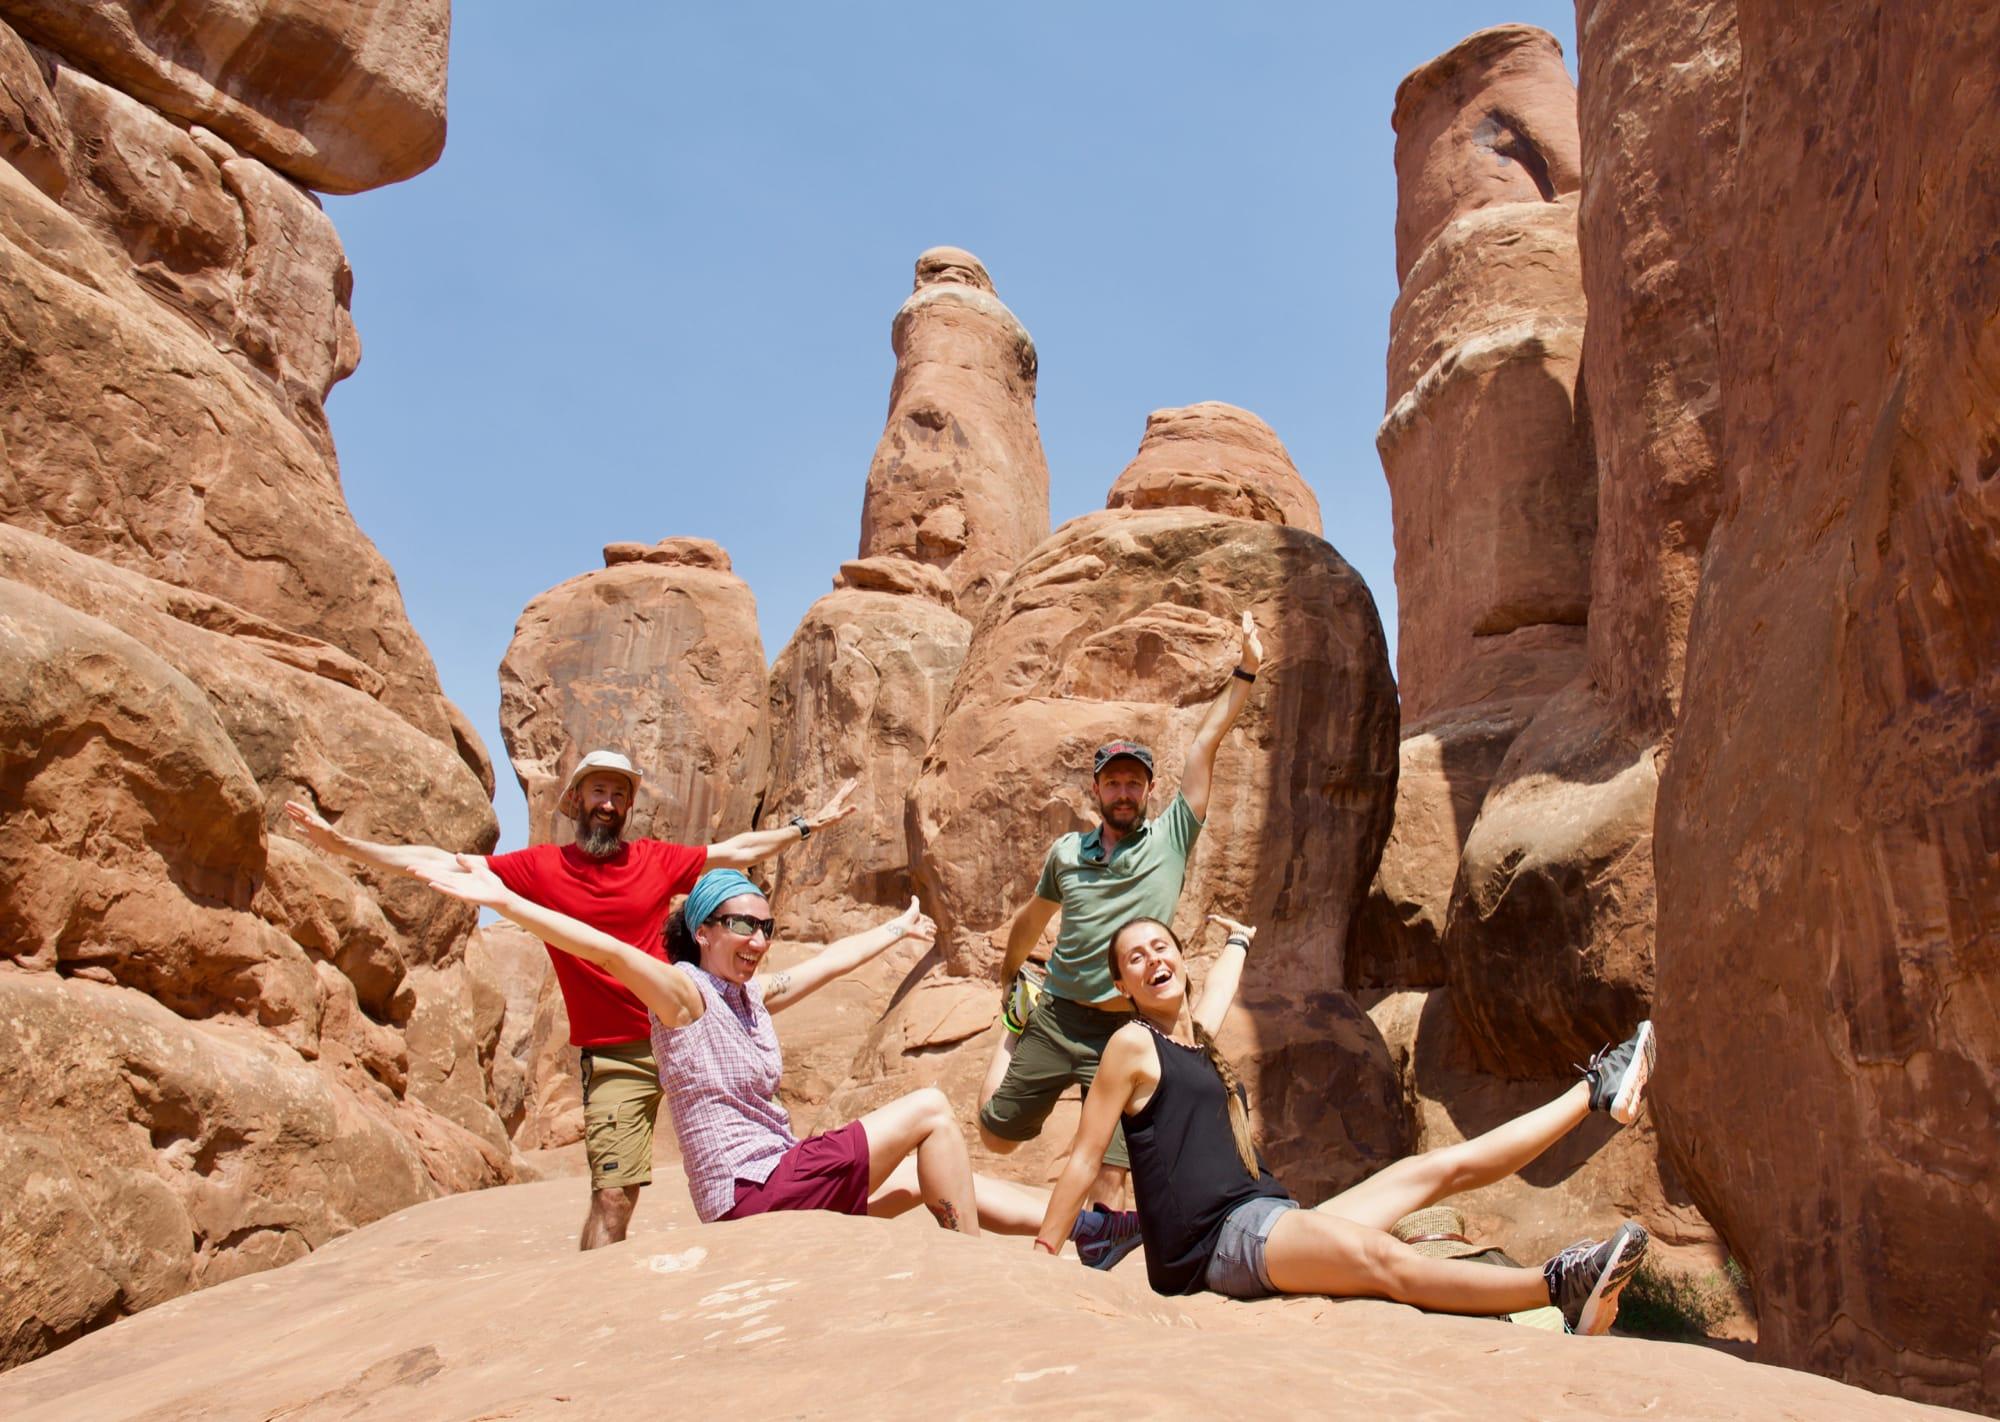 Foto di gruppo, Arches National Park